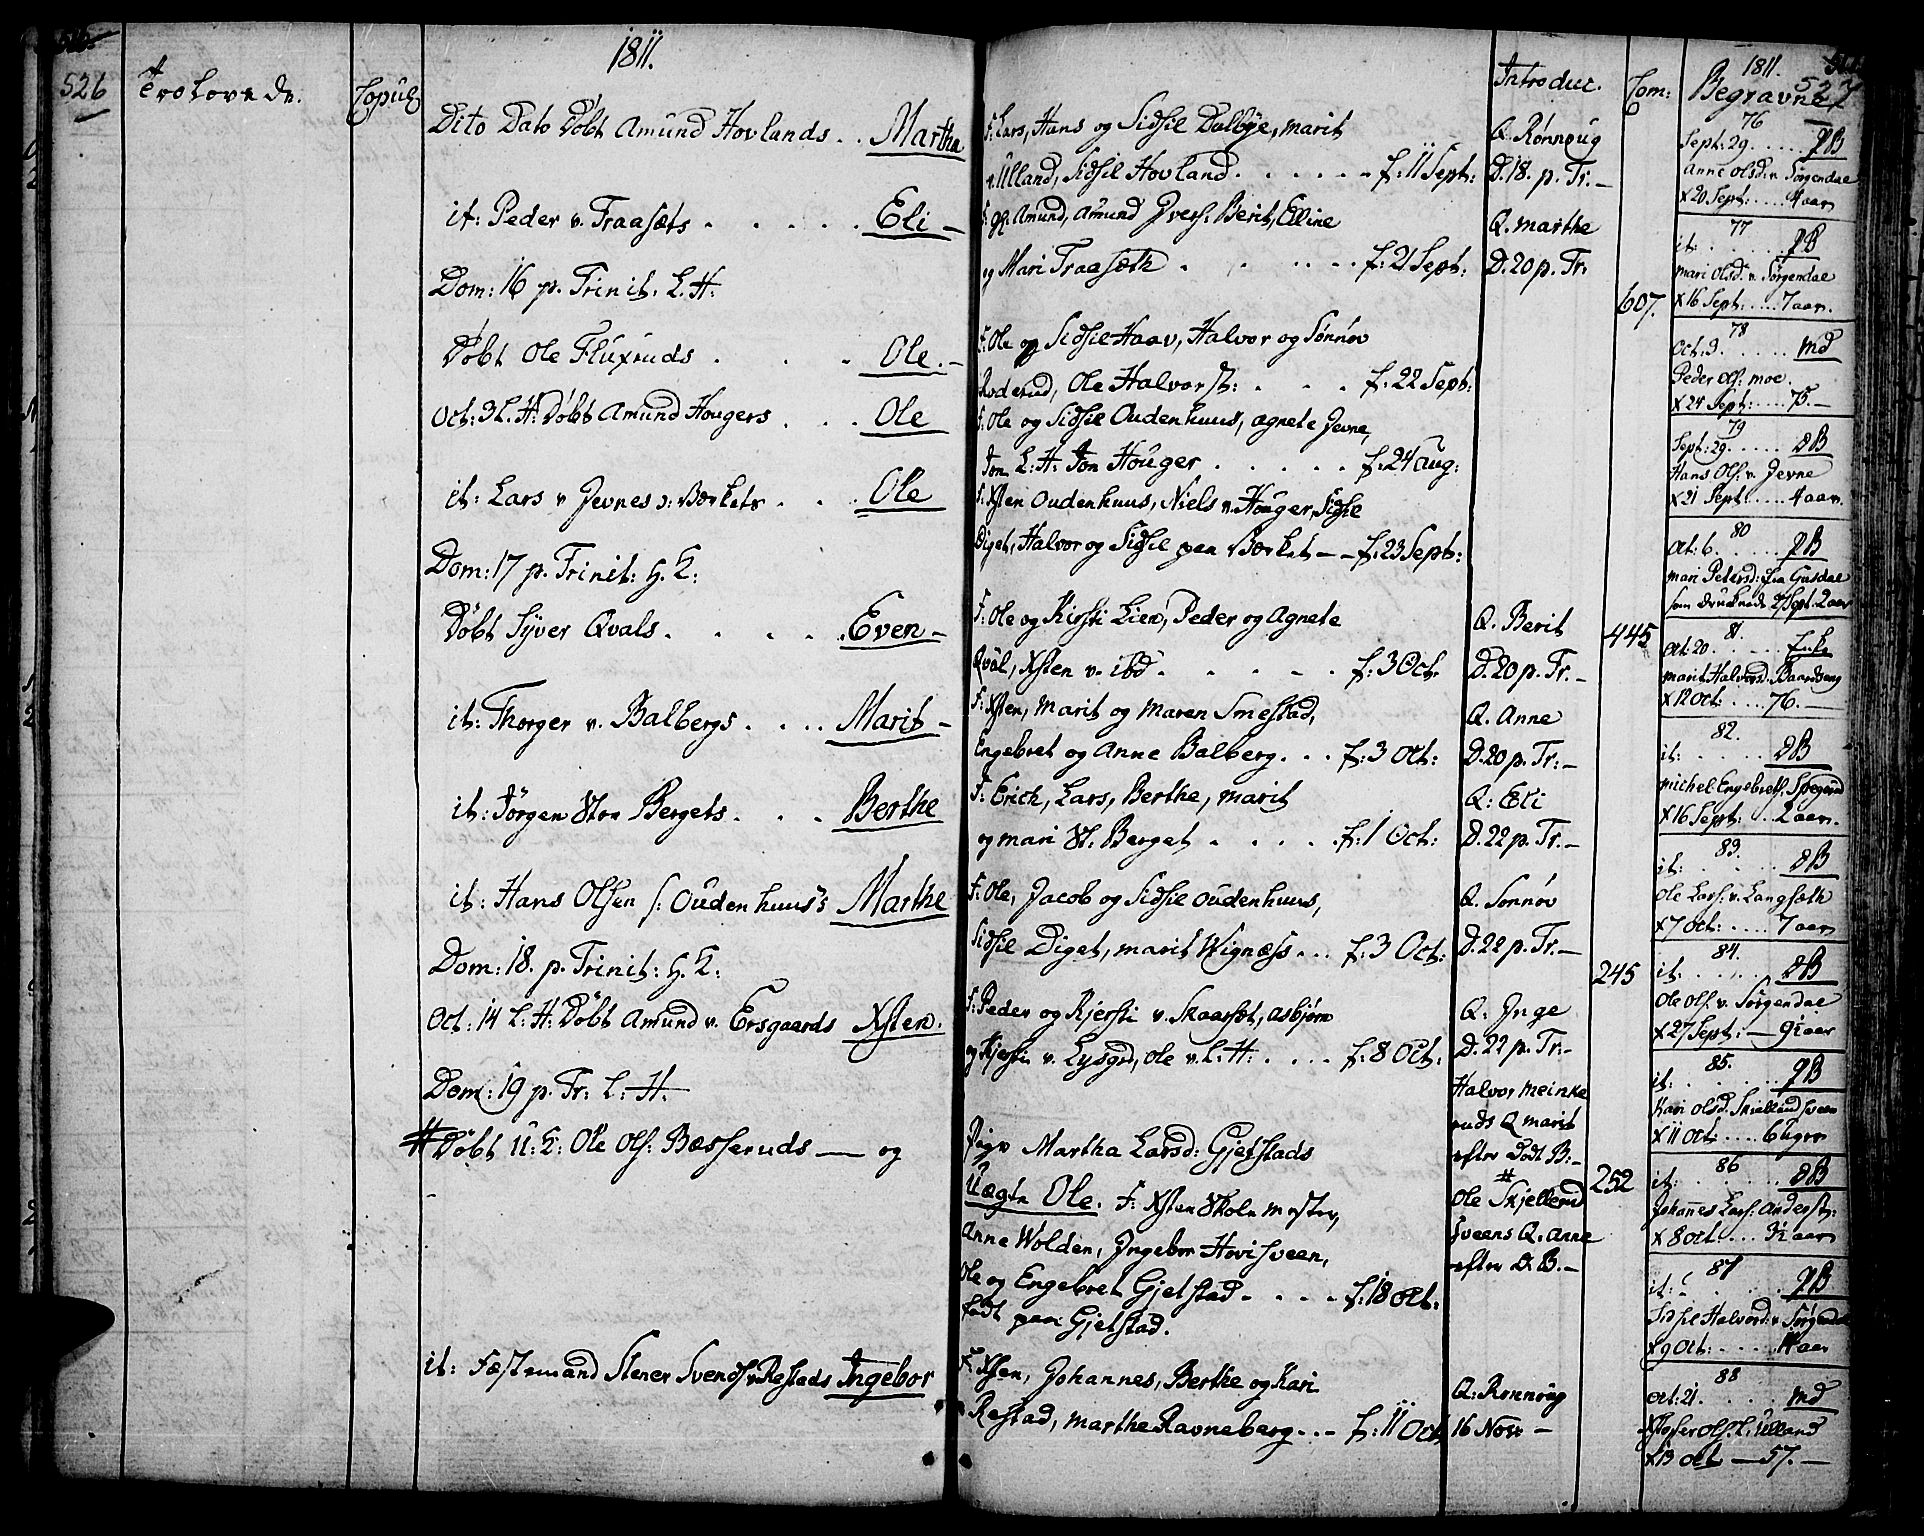 SAH, Fåberg prestekontor, Ministerialbok nr. 2, 1775-1818, s. 526-527